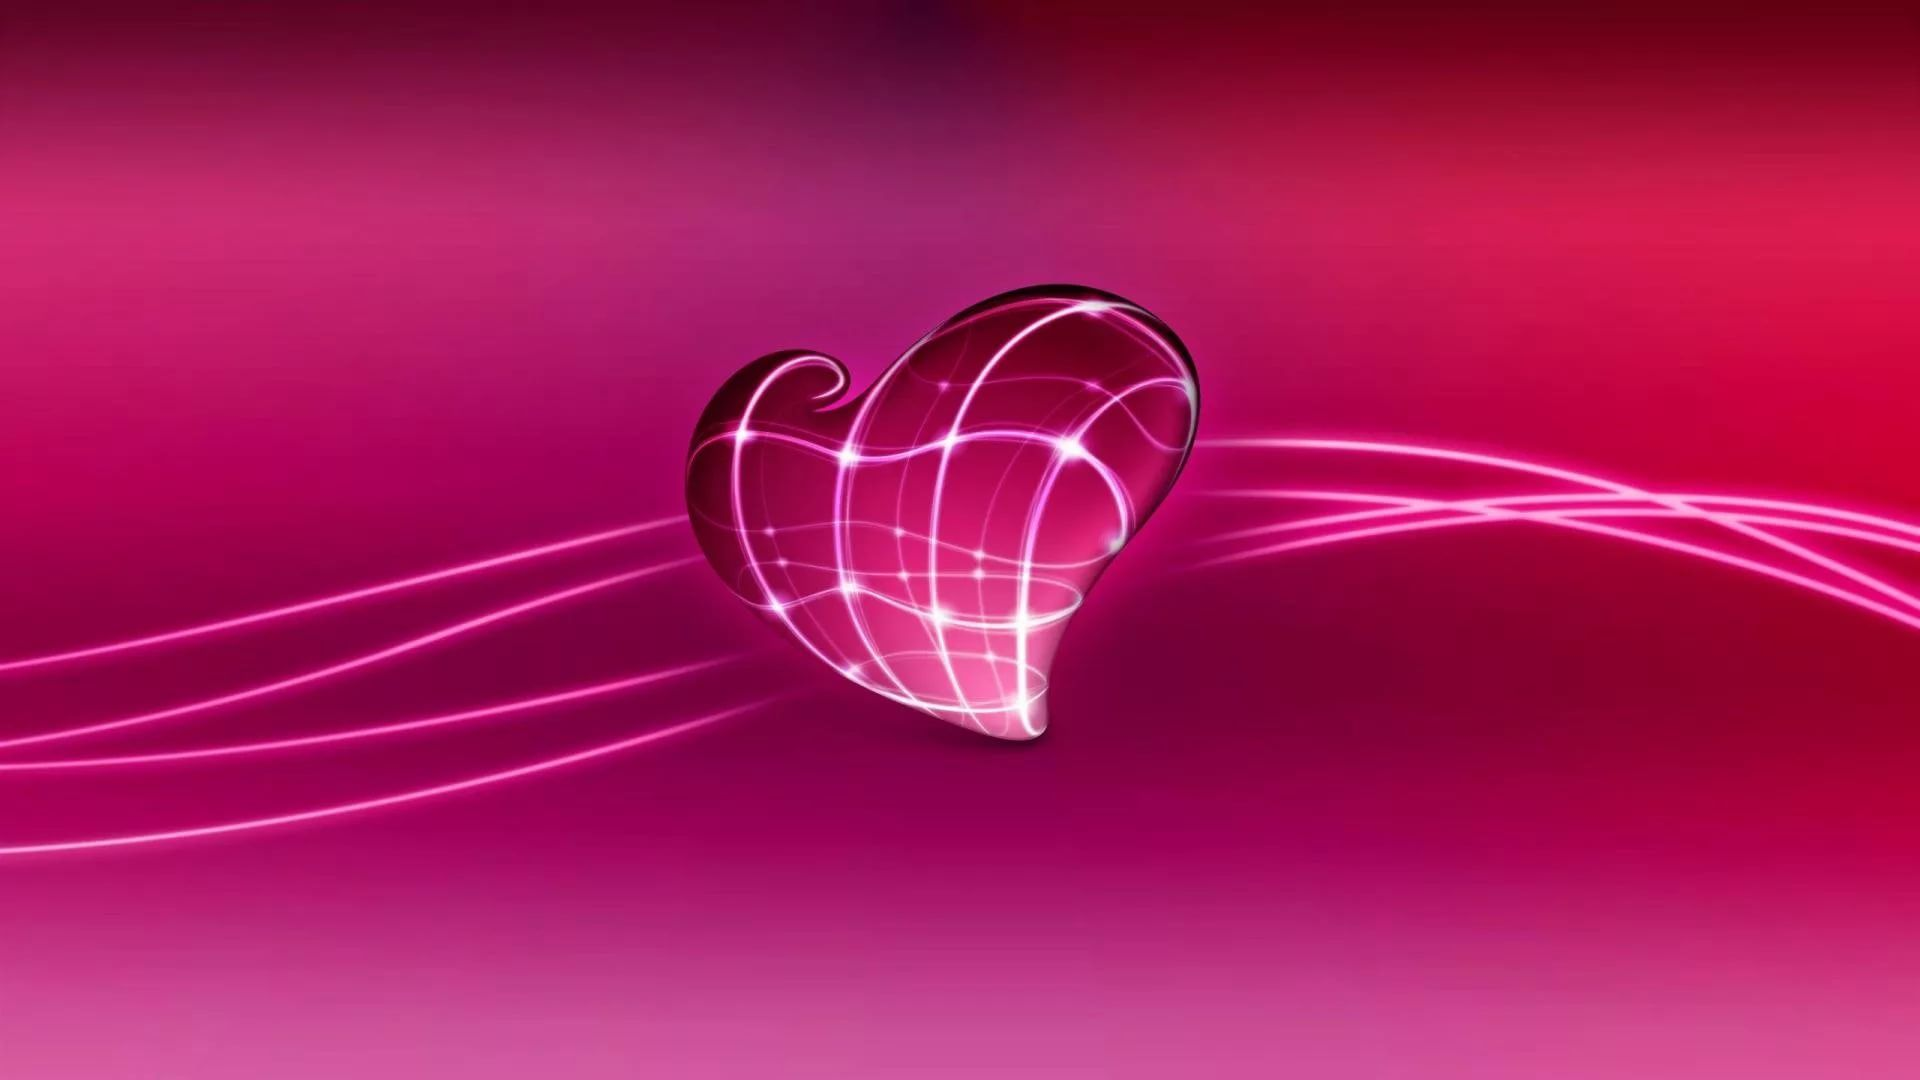 Valentine Screensaver wallpaper download